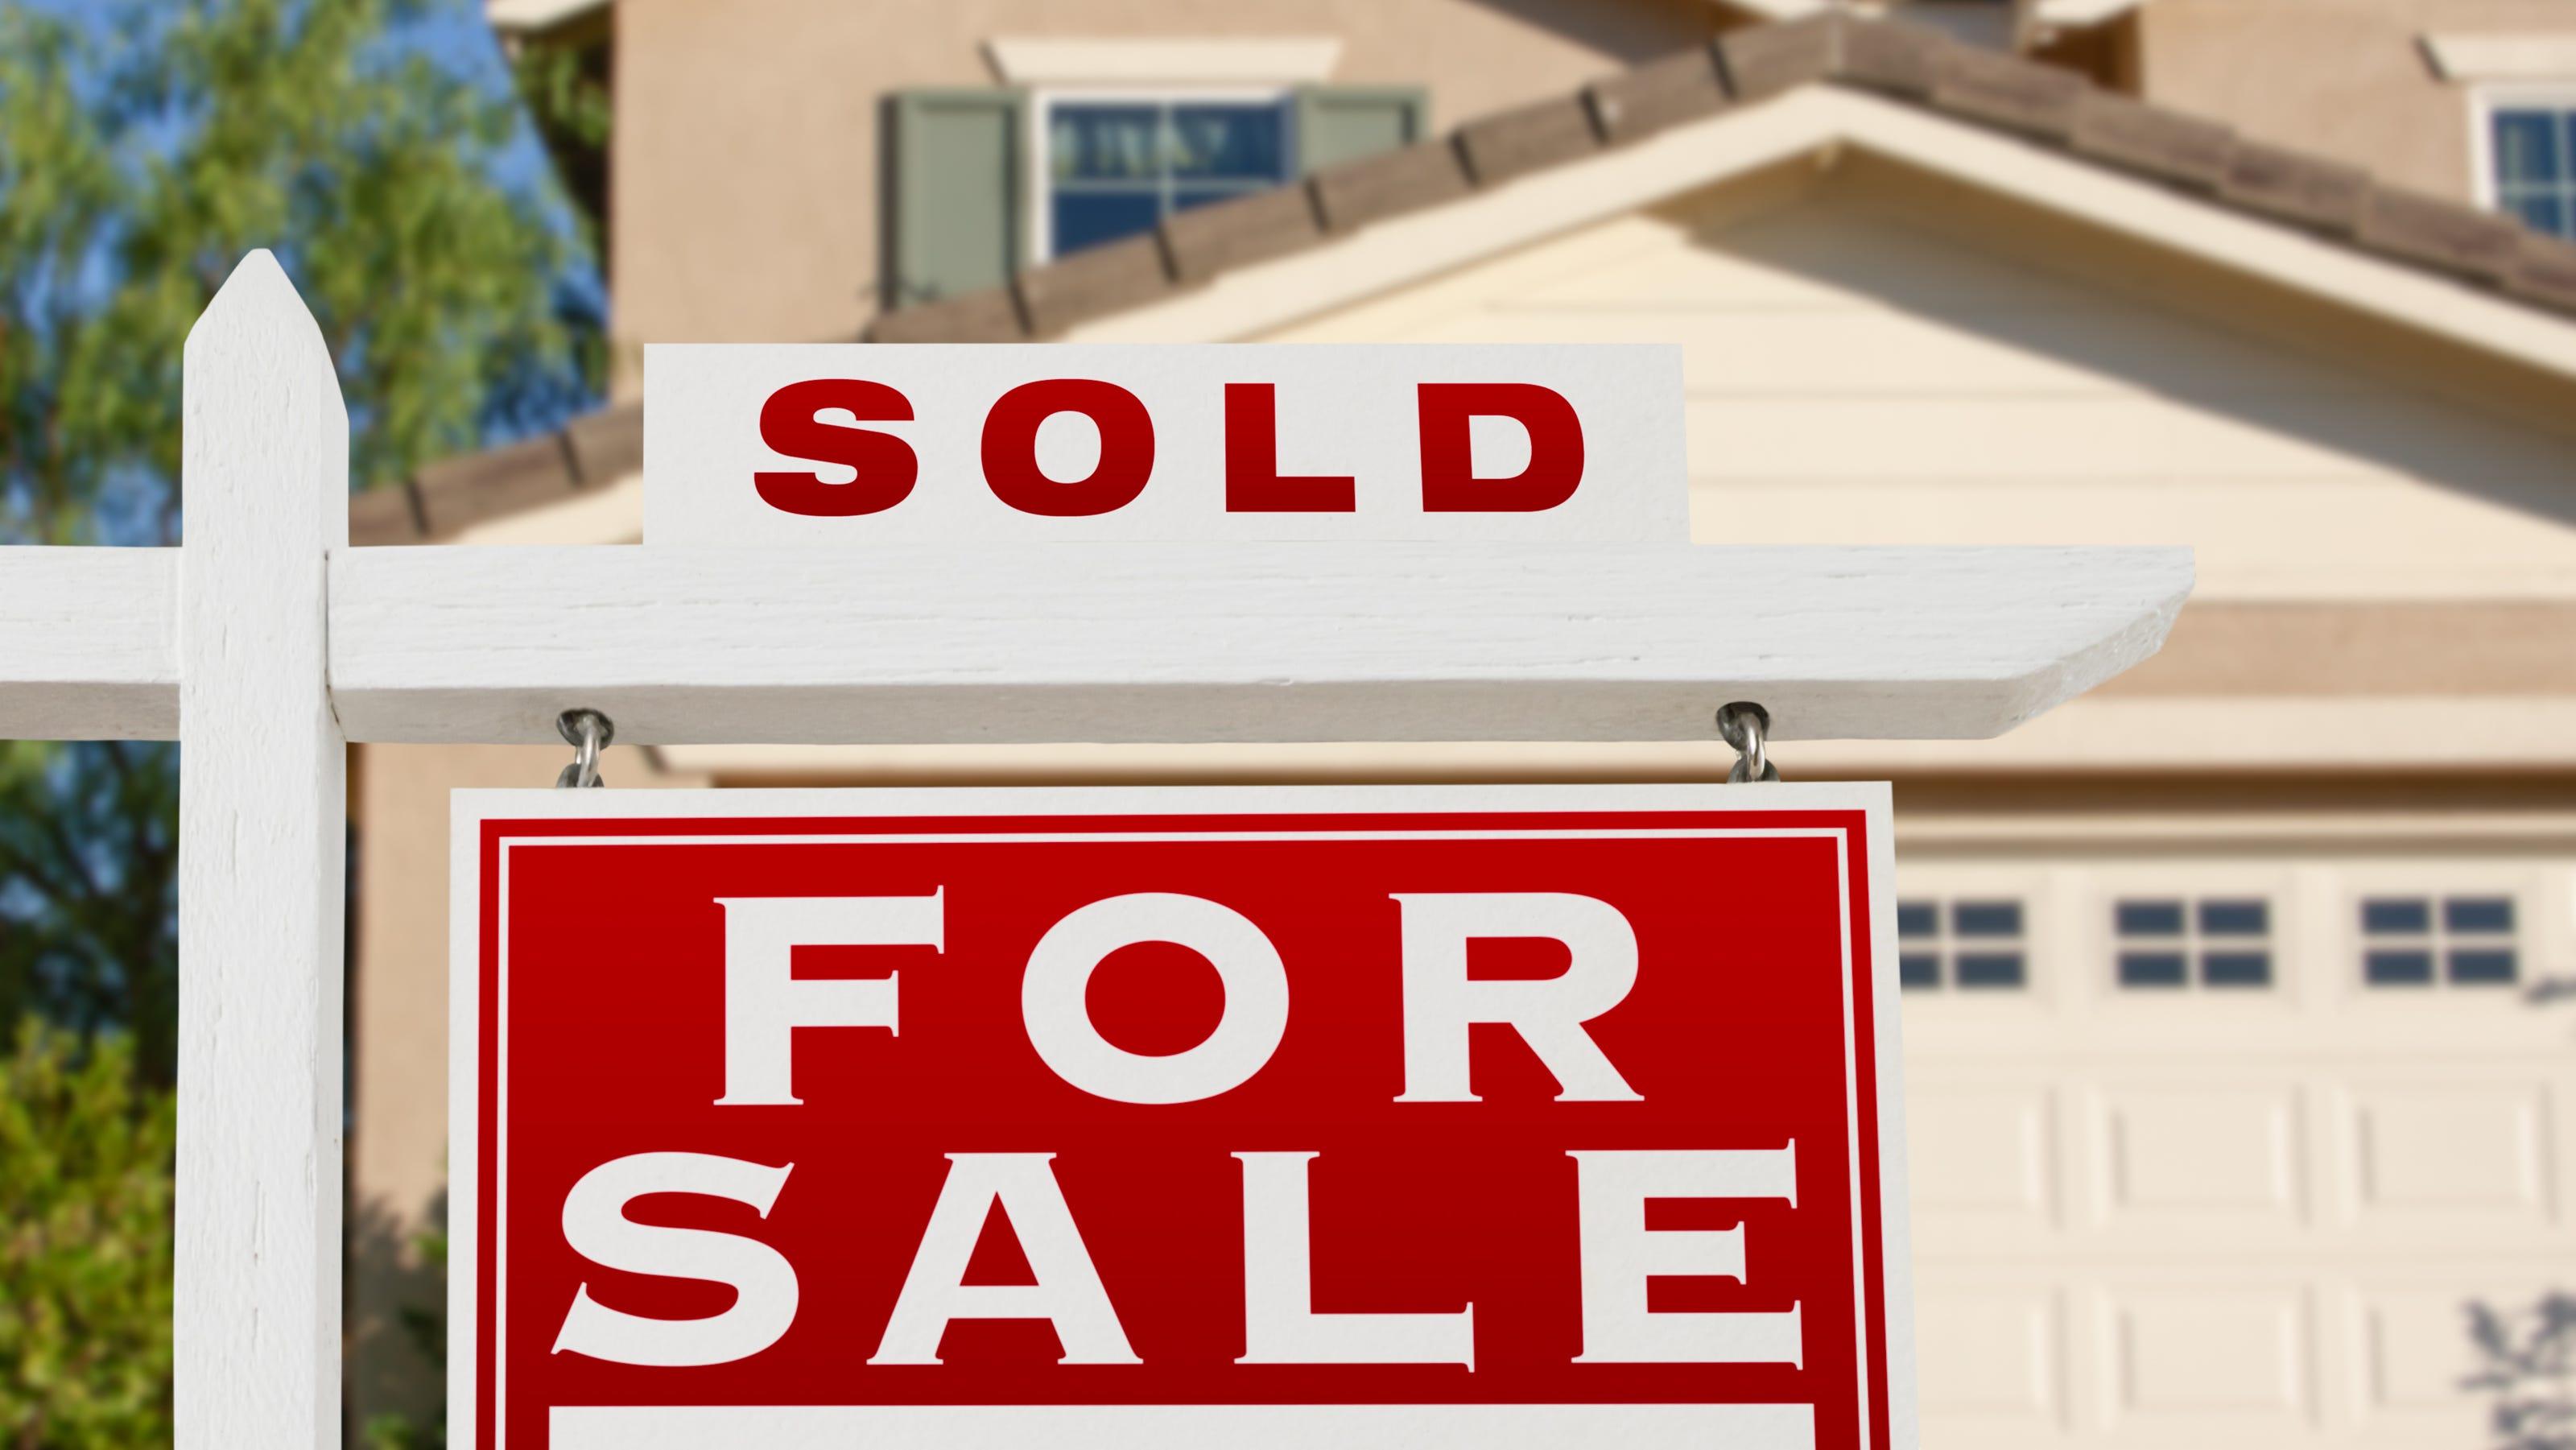 55a69652 9d19 43fb bcff 9e87b391d362 House for Sale jpg?crop=3506,1973,x0,y519&width=3200&height=1801&format=pjpg&auto=webp.